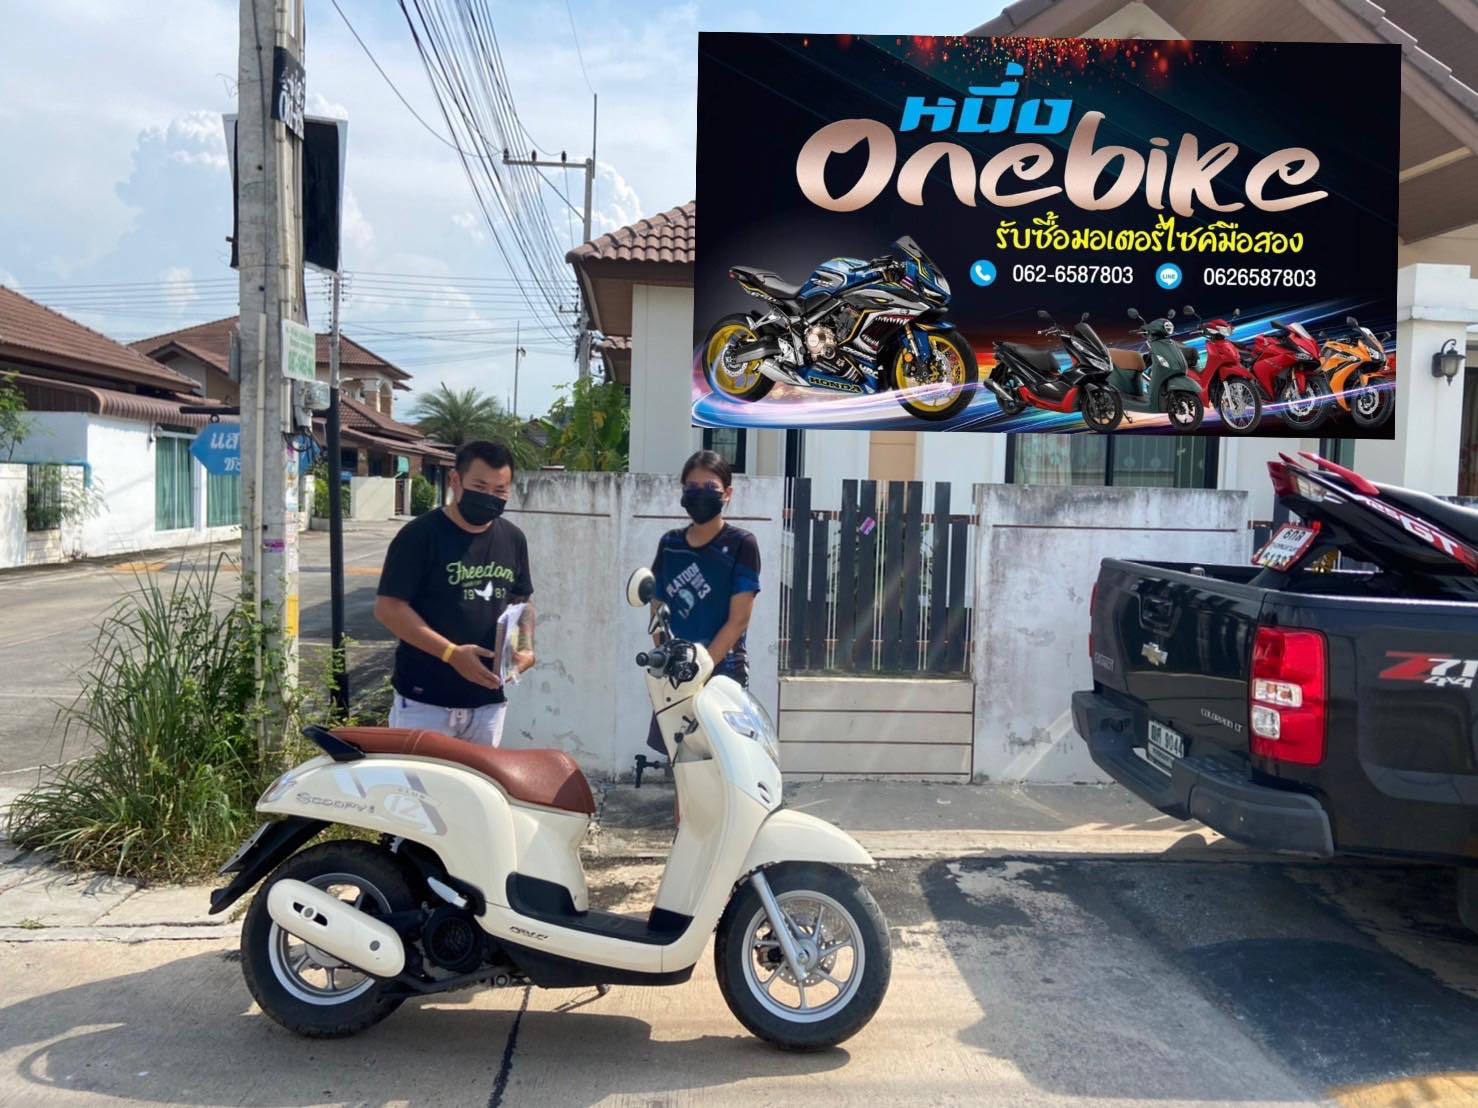 ONEBIKE รับซื้อรถมอเตอร์ไซค์ชลบุรี